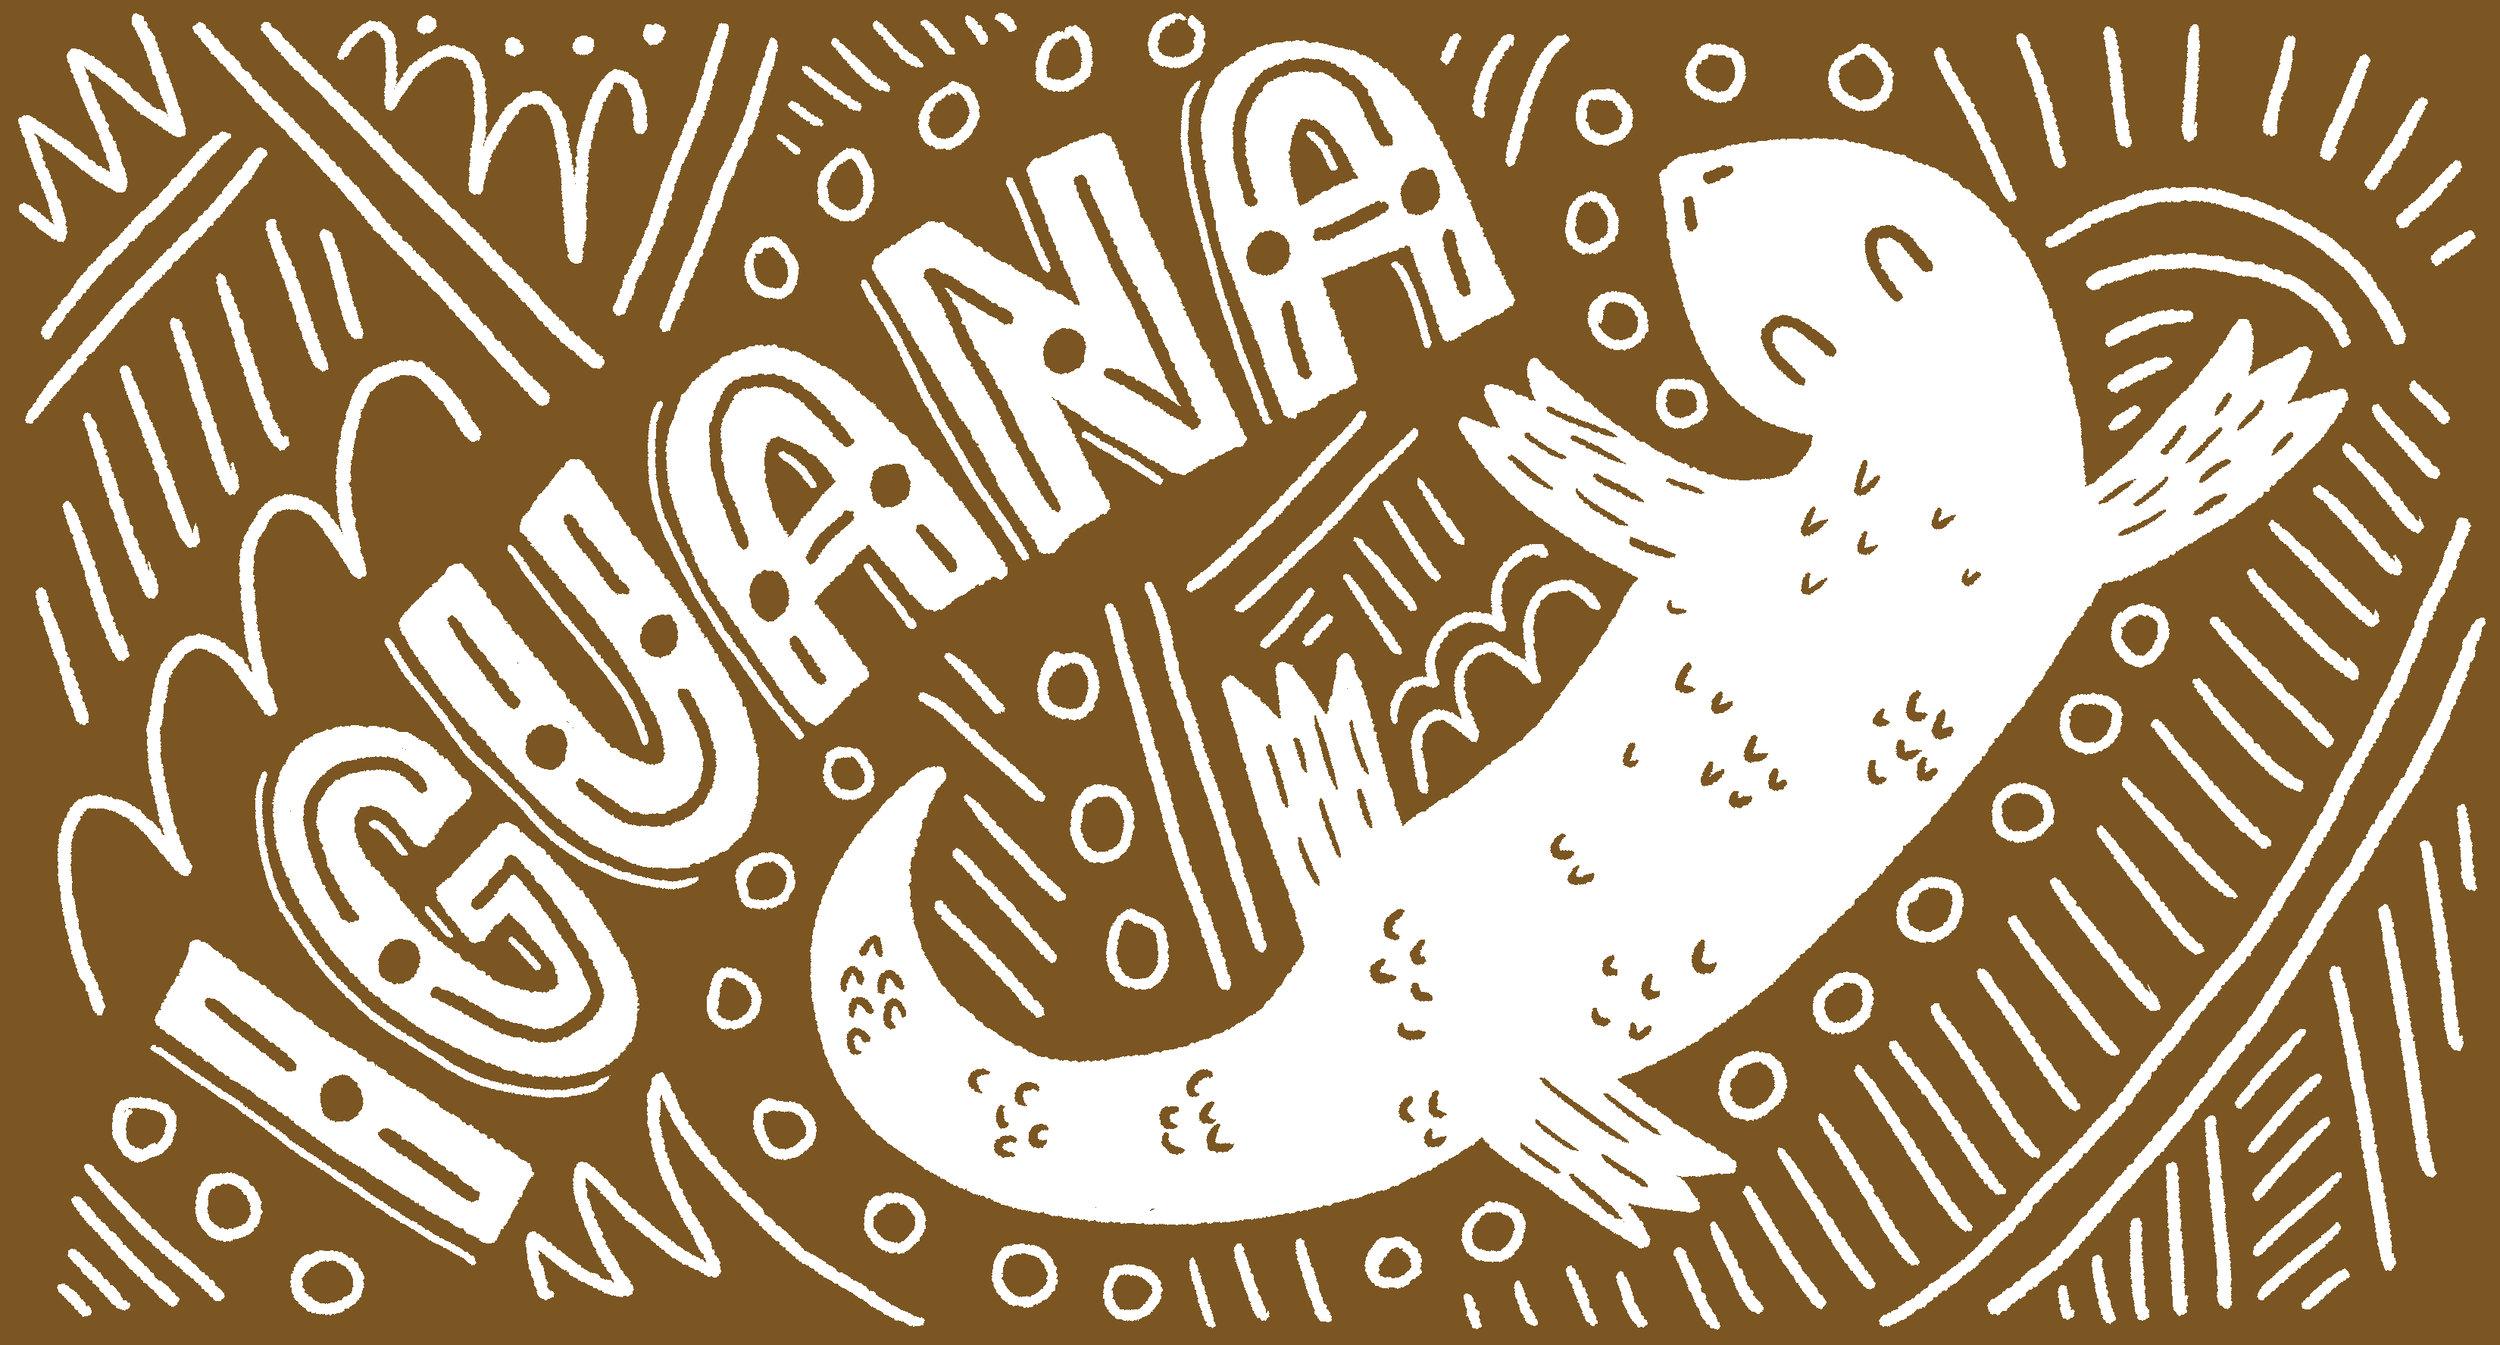 033-iguana.jpg